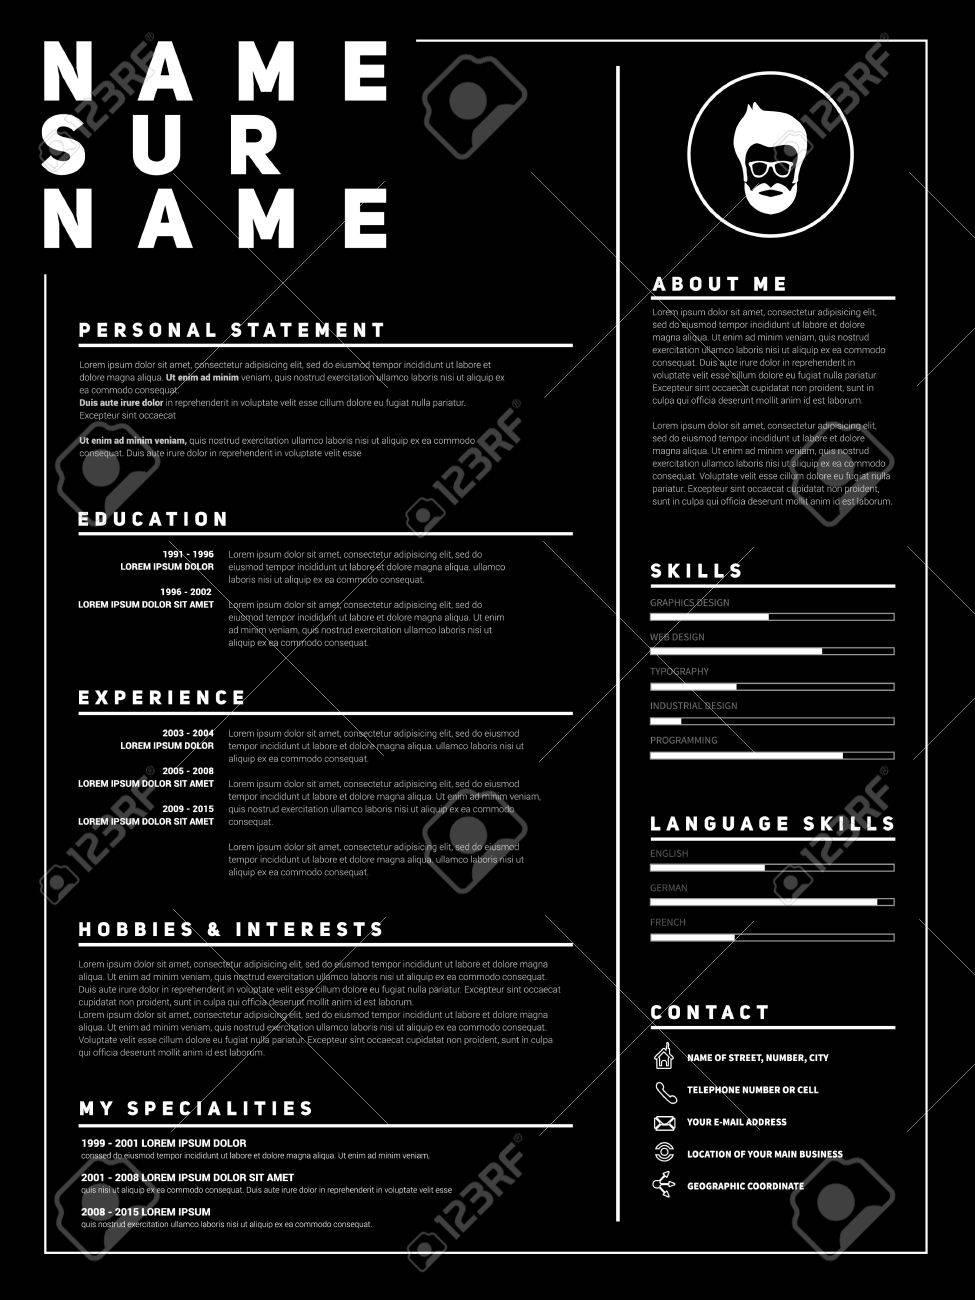 resume minimalist cv template with simple design company application cv curriculum vitae - Ce Resume